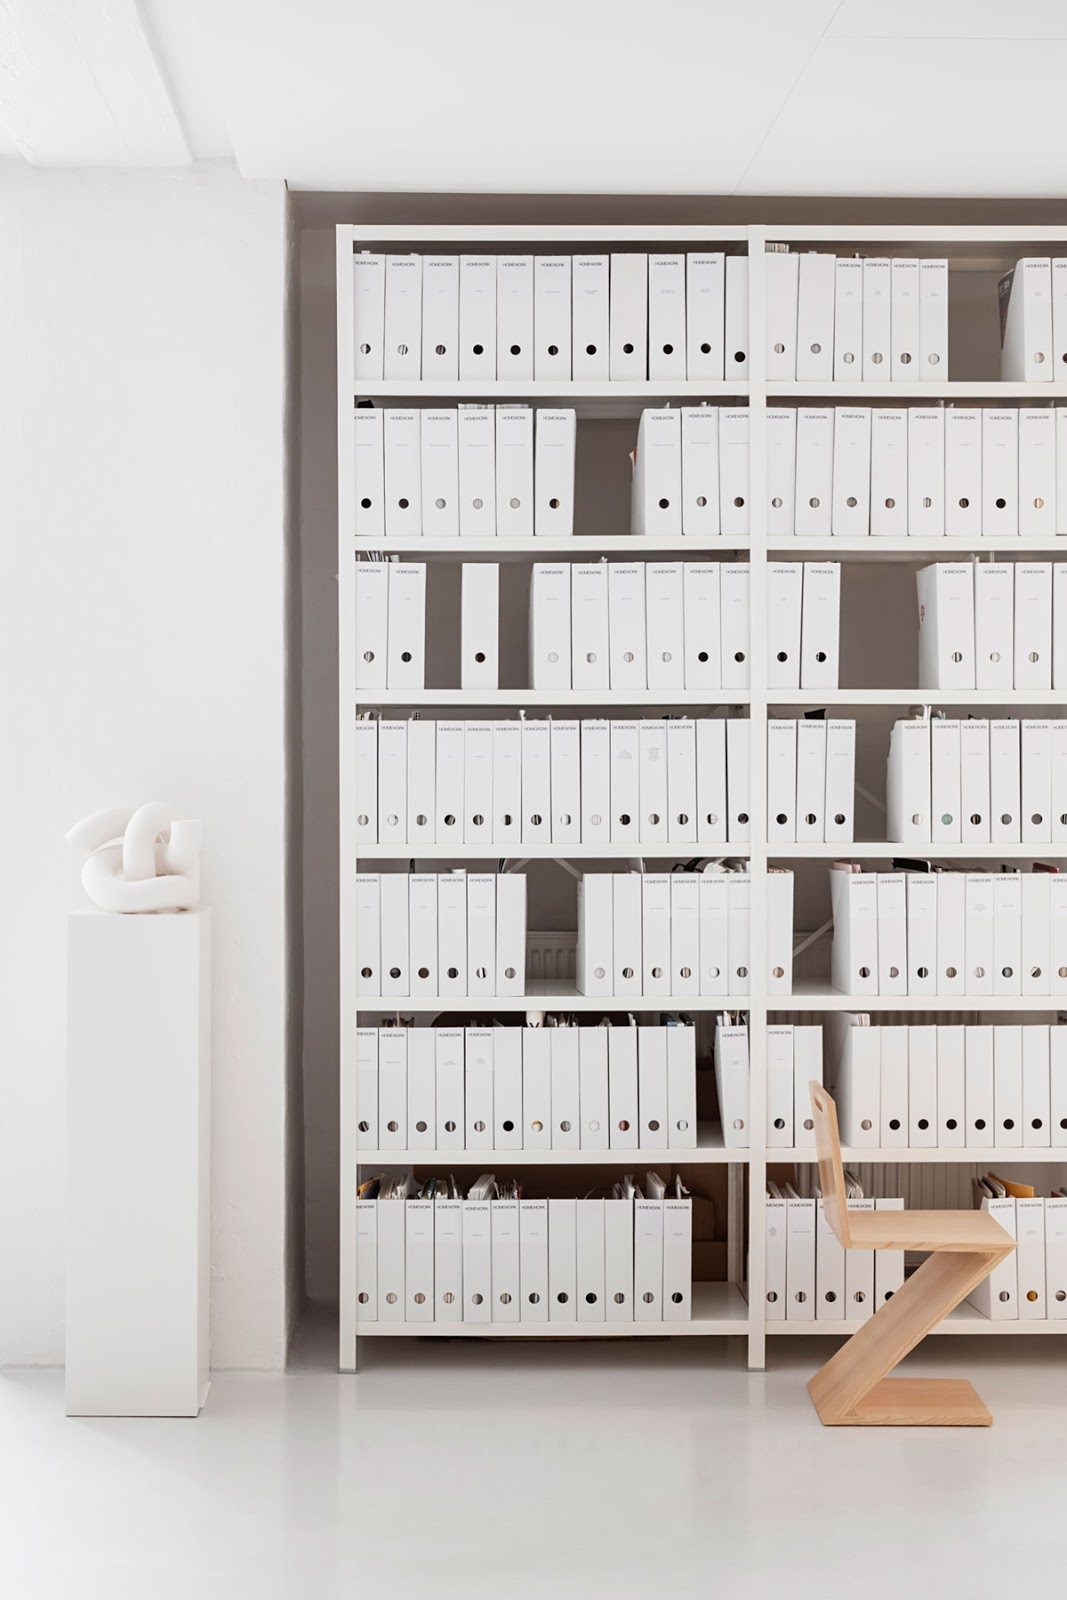 Increible estantería de oficina con todas las carpetas blanca